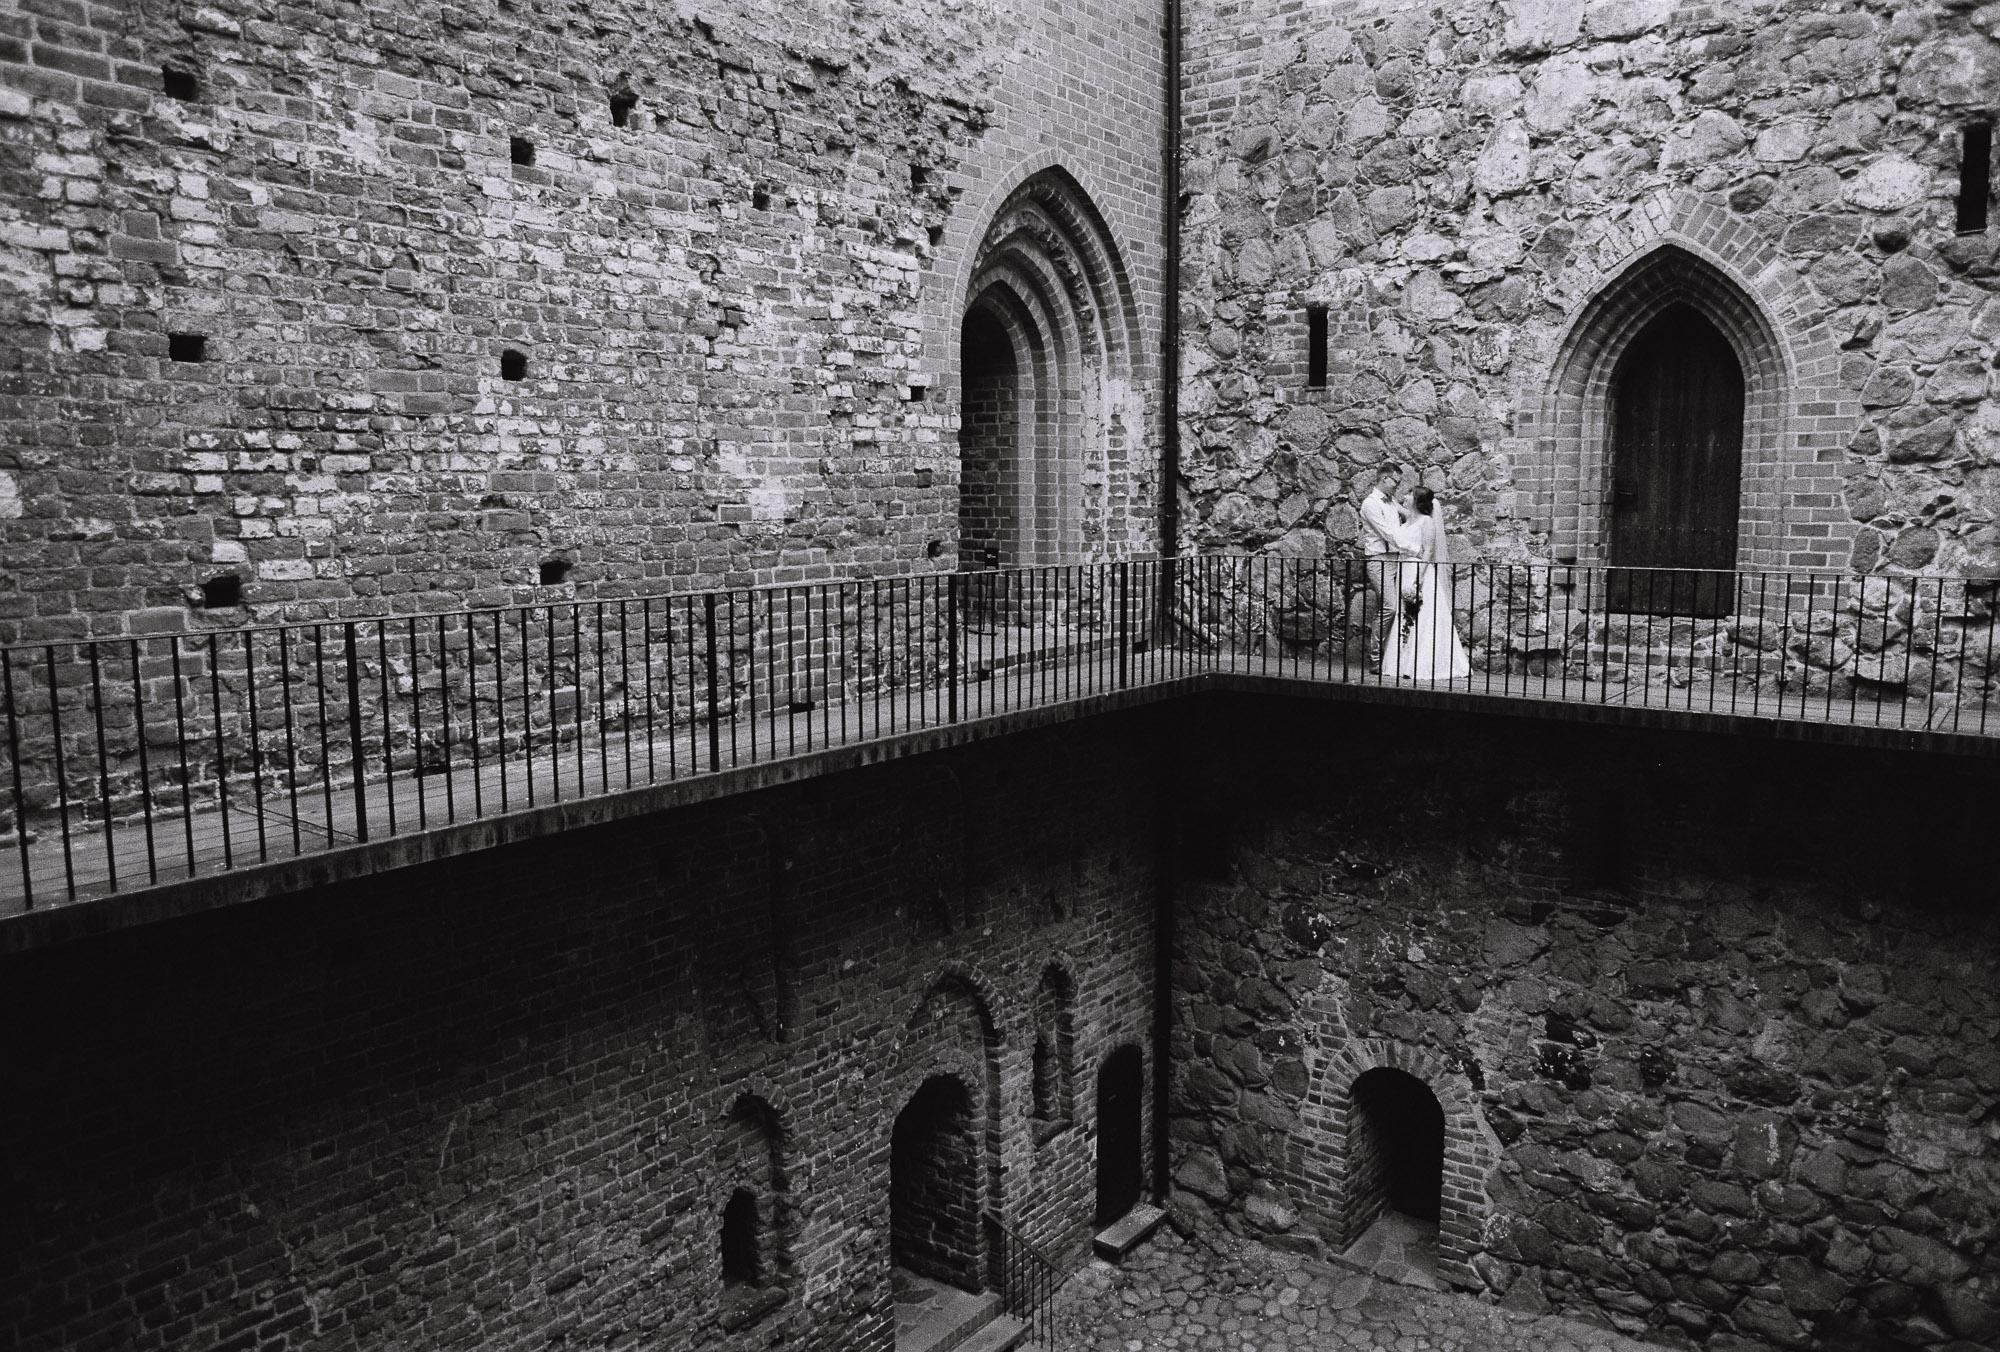 jere-satamo-analog-film-wedding-photographer-finland-185.jpg